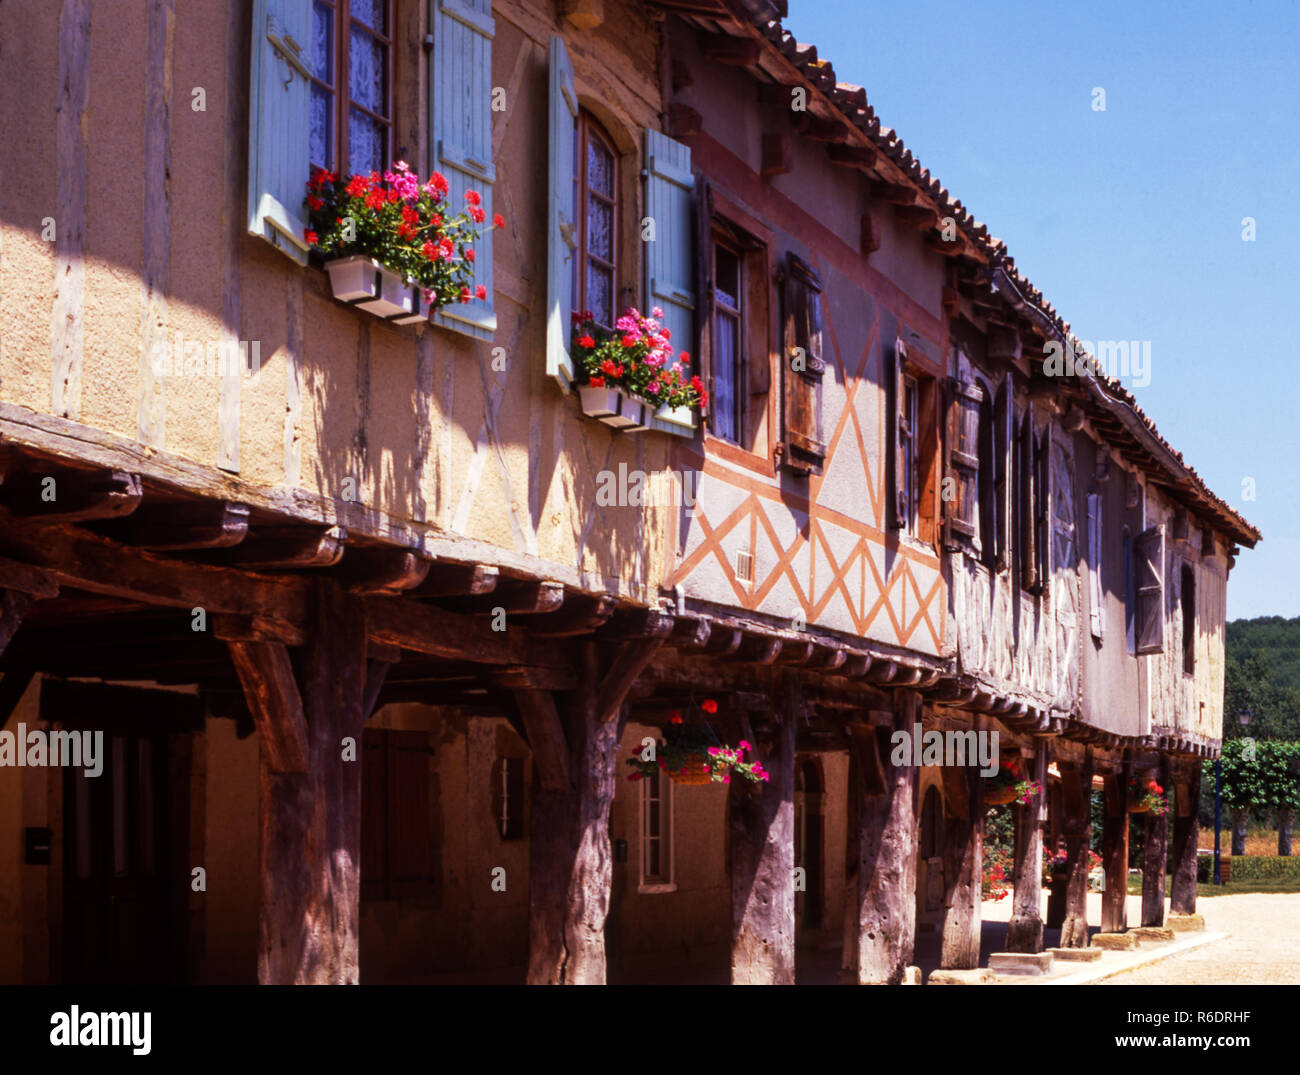 France.Dept. Gers. Half timbered houses in Bastide village of Tillac. - Stock Image